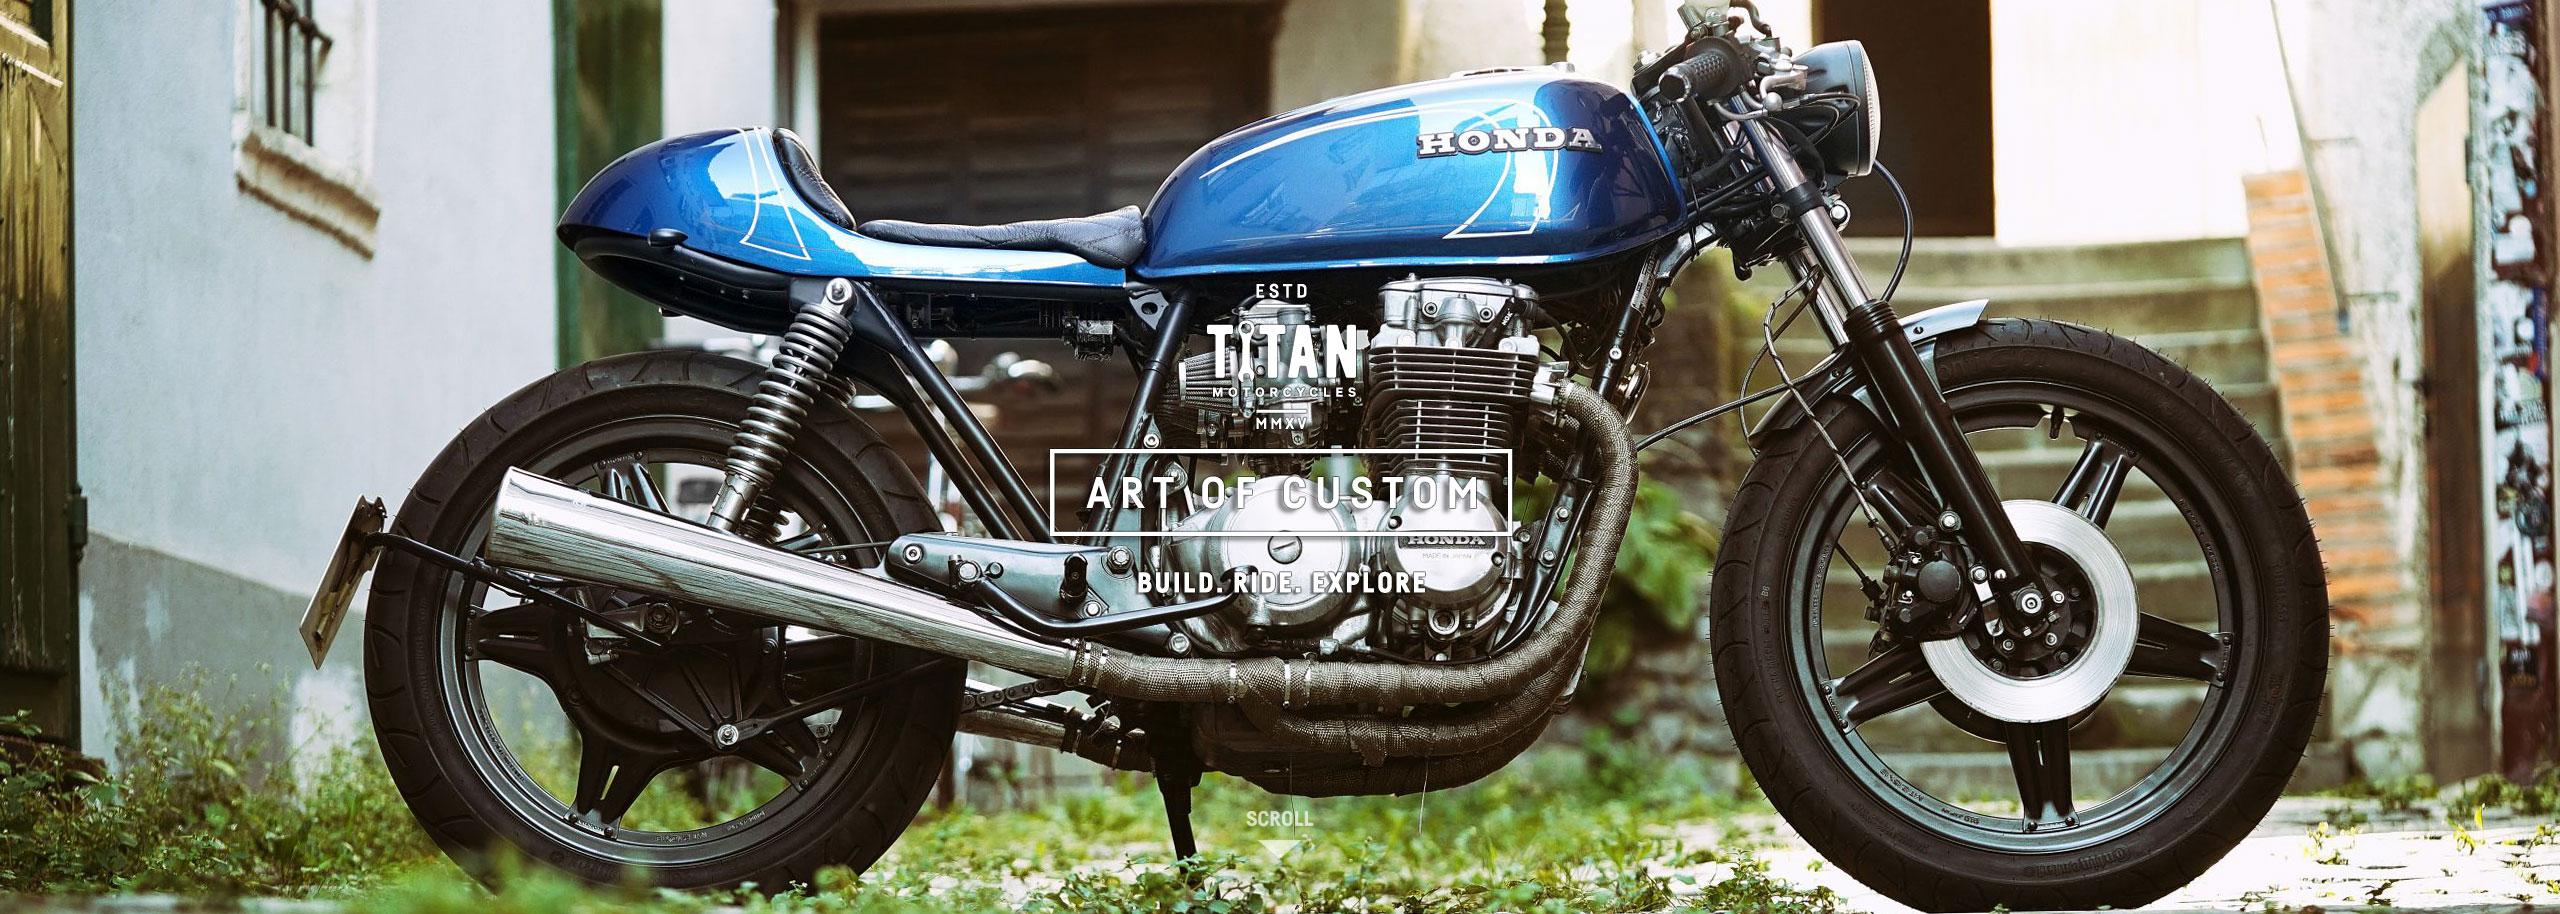 01_TITAN-BLUE-VALENTINE_Honda-Umba-CB-650-Four_Cafe-Racer-Graz-Motorrad-Umbau-Oesterreich-Vintage_Custom-Bikes-Einzigartiges-Design